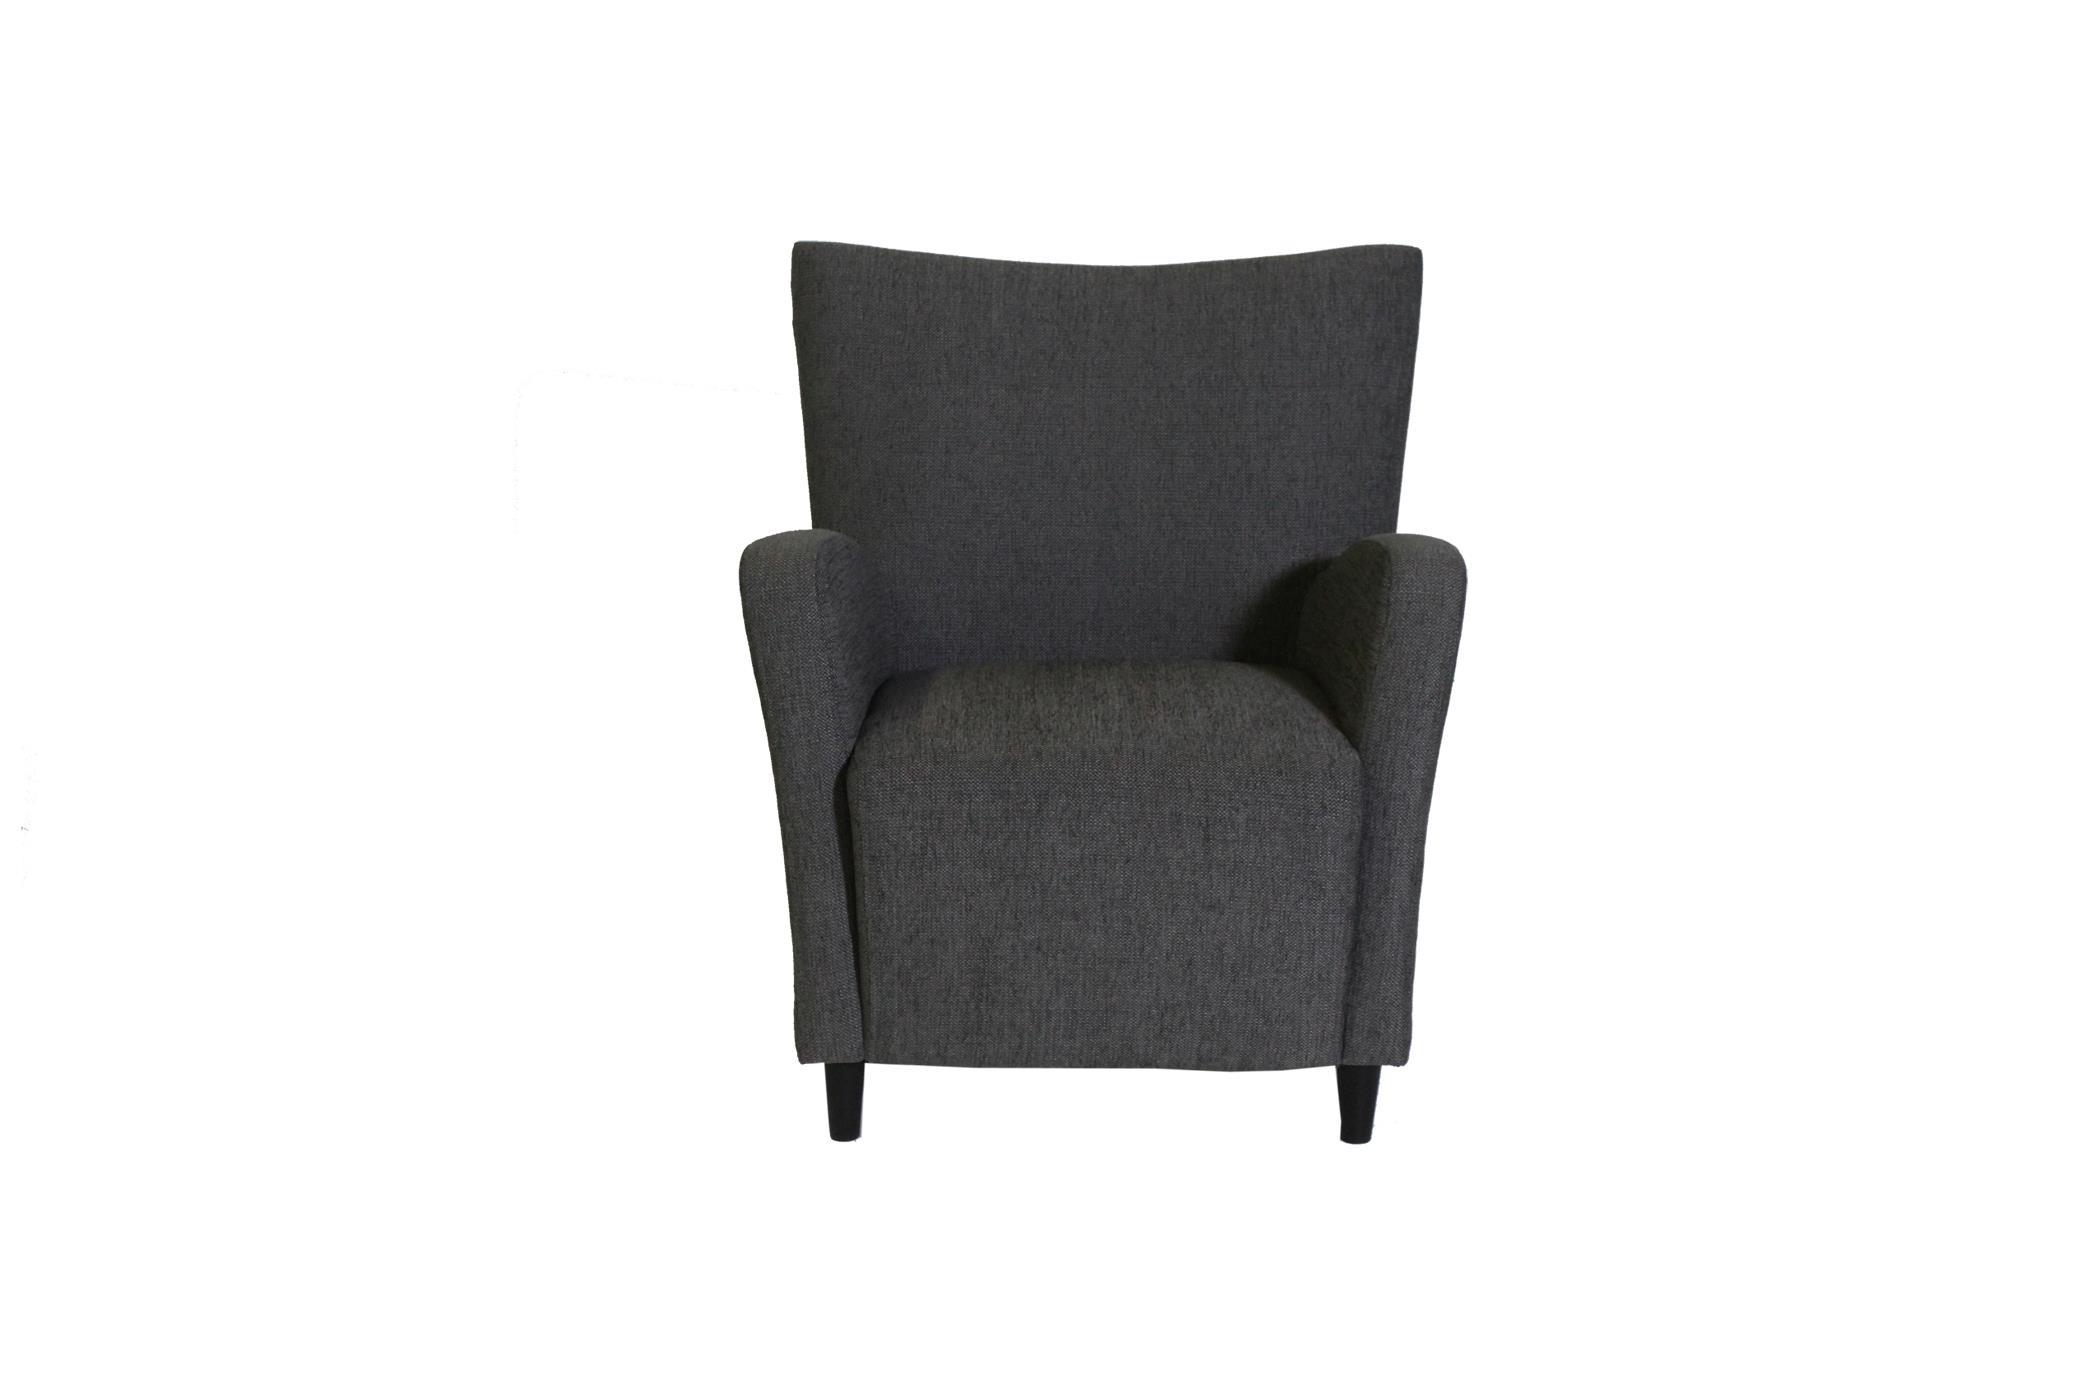 Actona Company Kenya Chair HomeWorld Furniture  : products2Factonacompany2Fcolor2Fkenyaacto000004034620kenya b6k5mxjkkbu6u2wx j9ahzw from www.homeworld.com size 2100 x 1400 jpeg 119kB